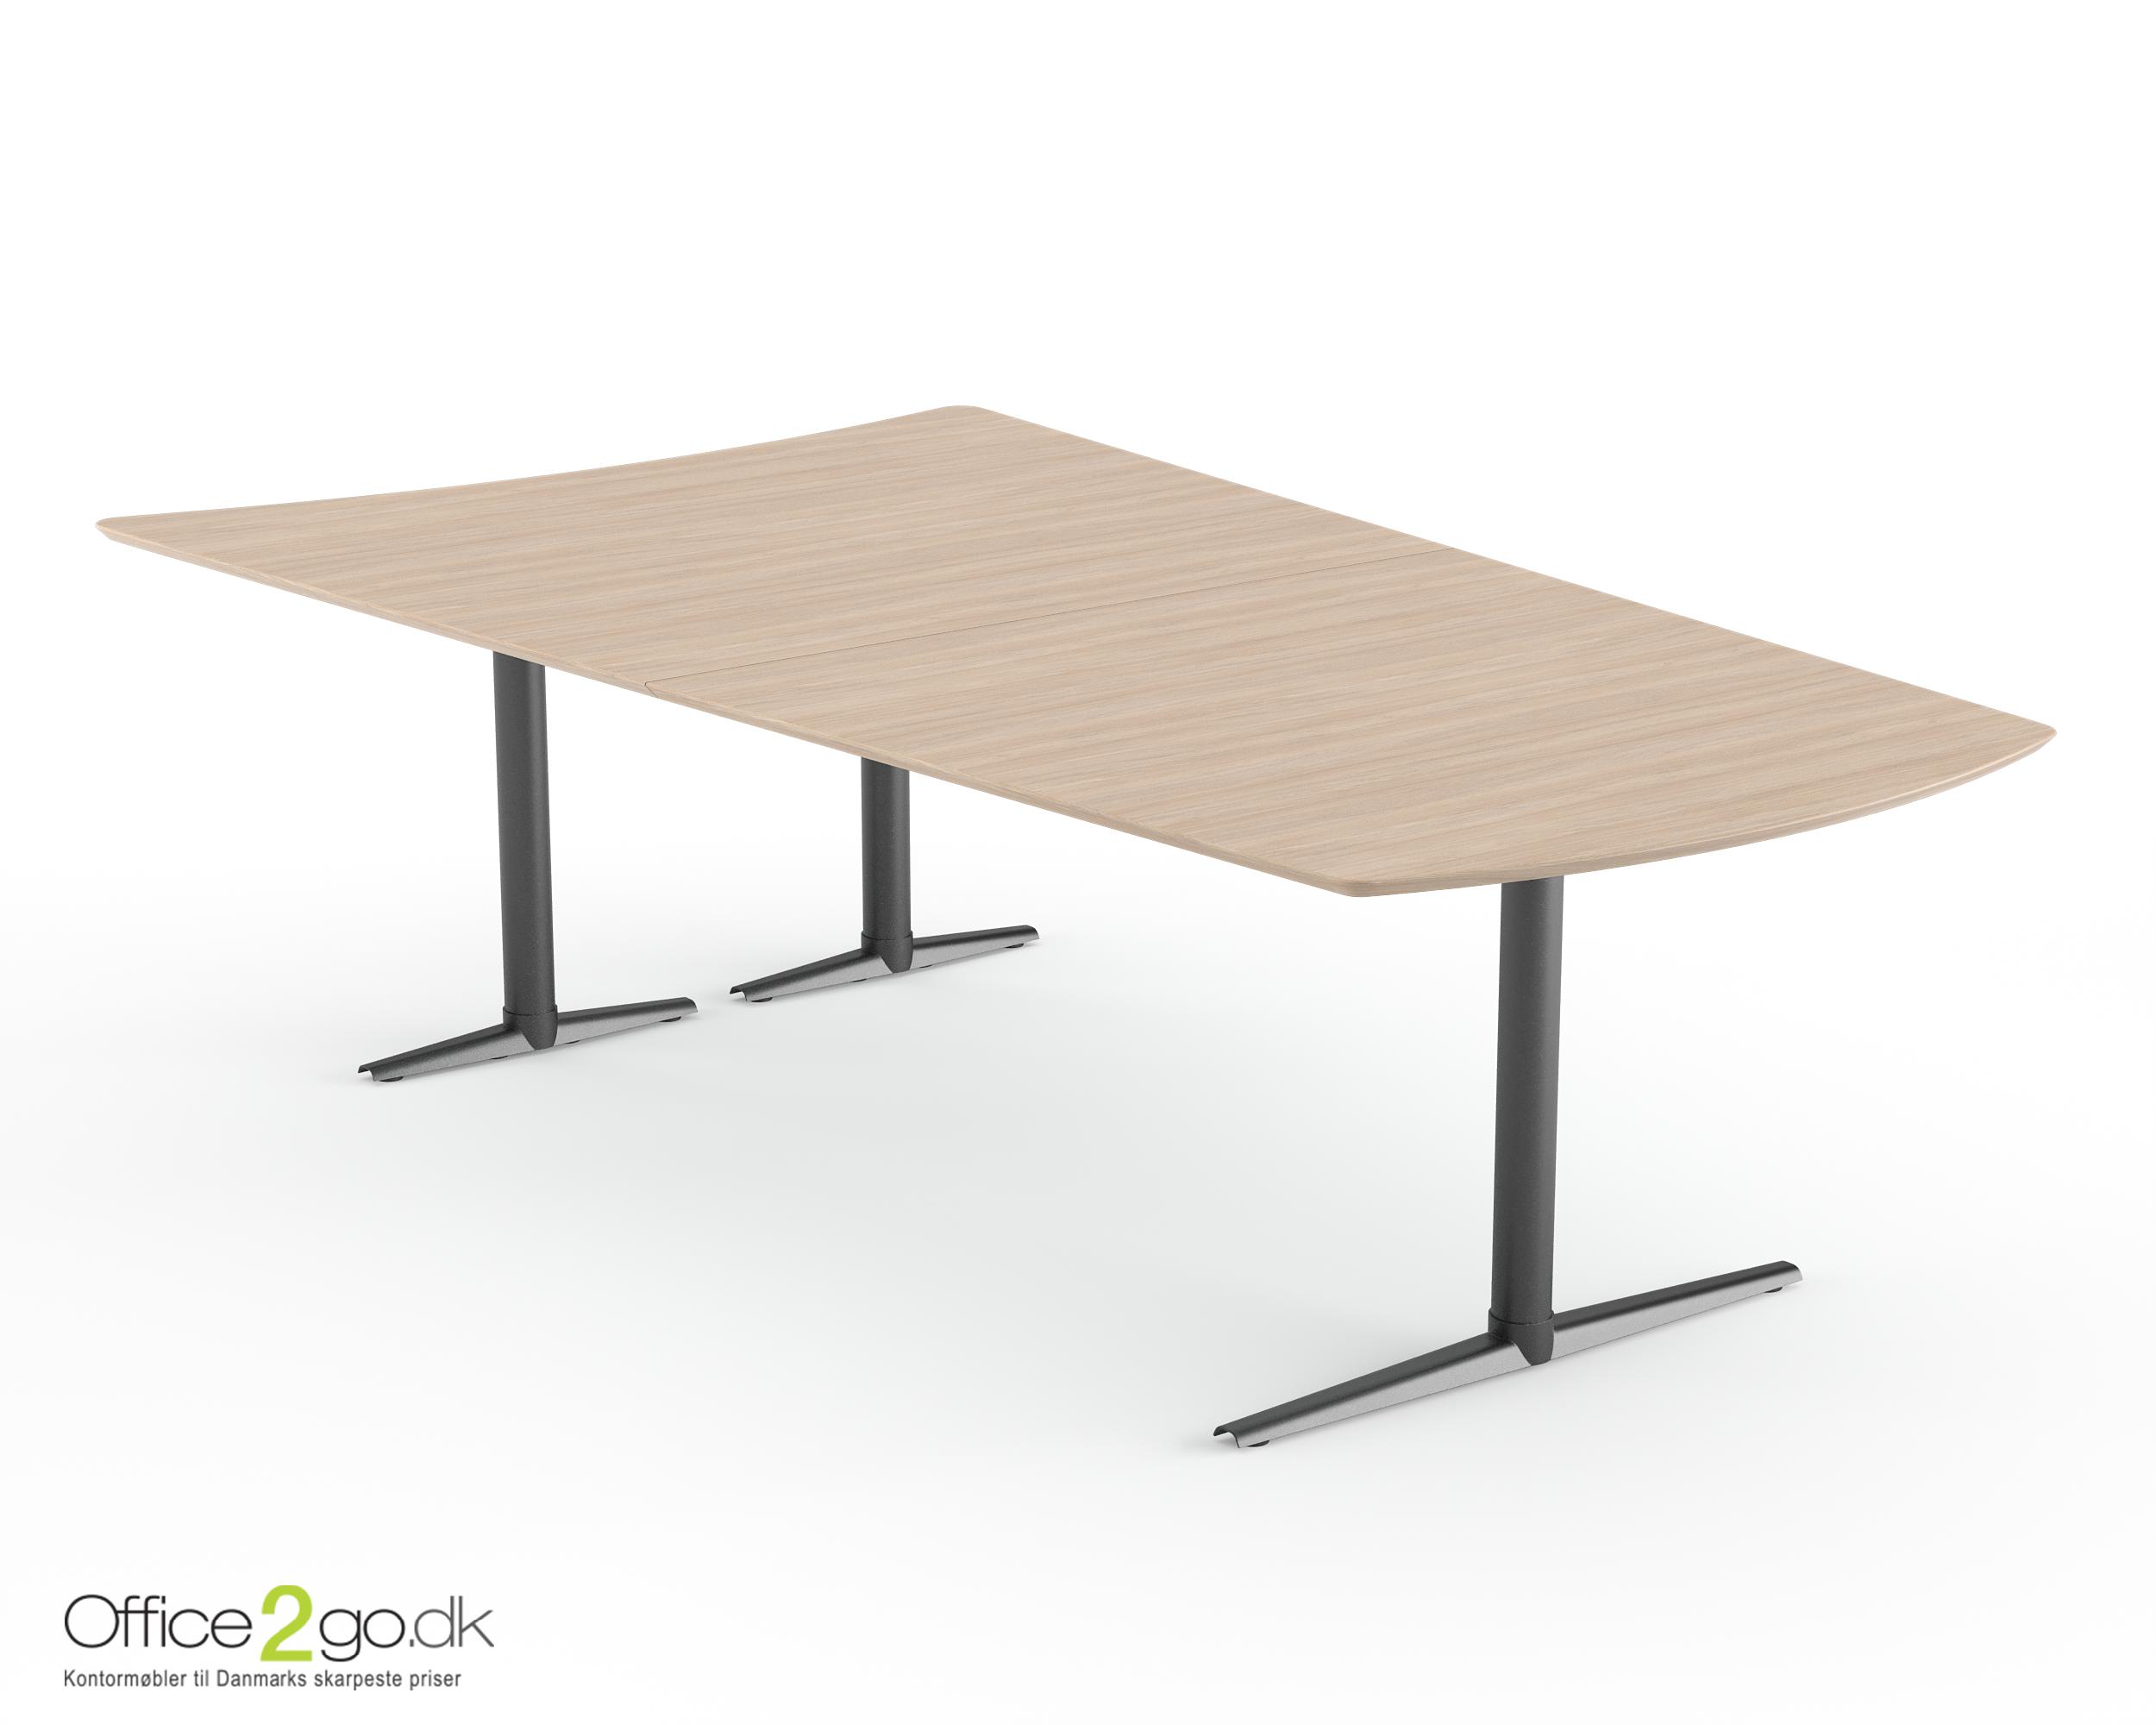 Switch Media mødebord - 8 personer - 250 cm.